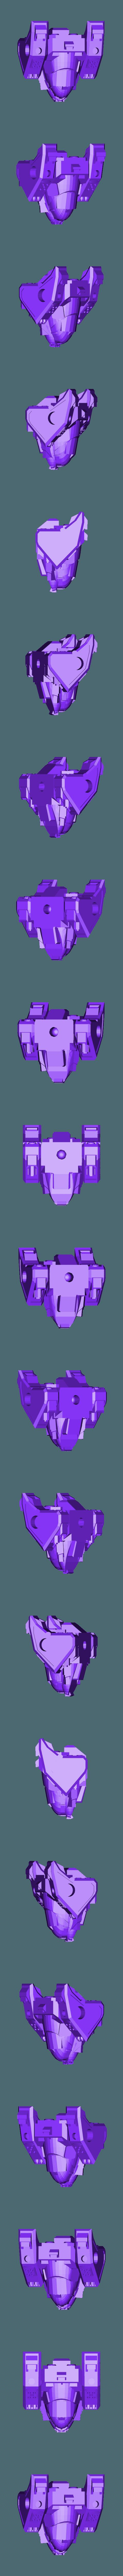 Torso.stl Download free STL file Modular Linebacker Mech • 3D printing object, mrhers2